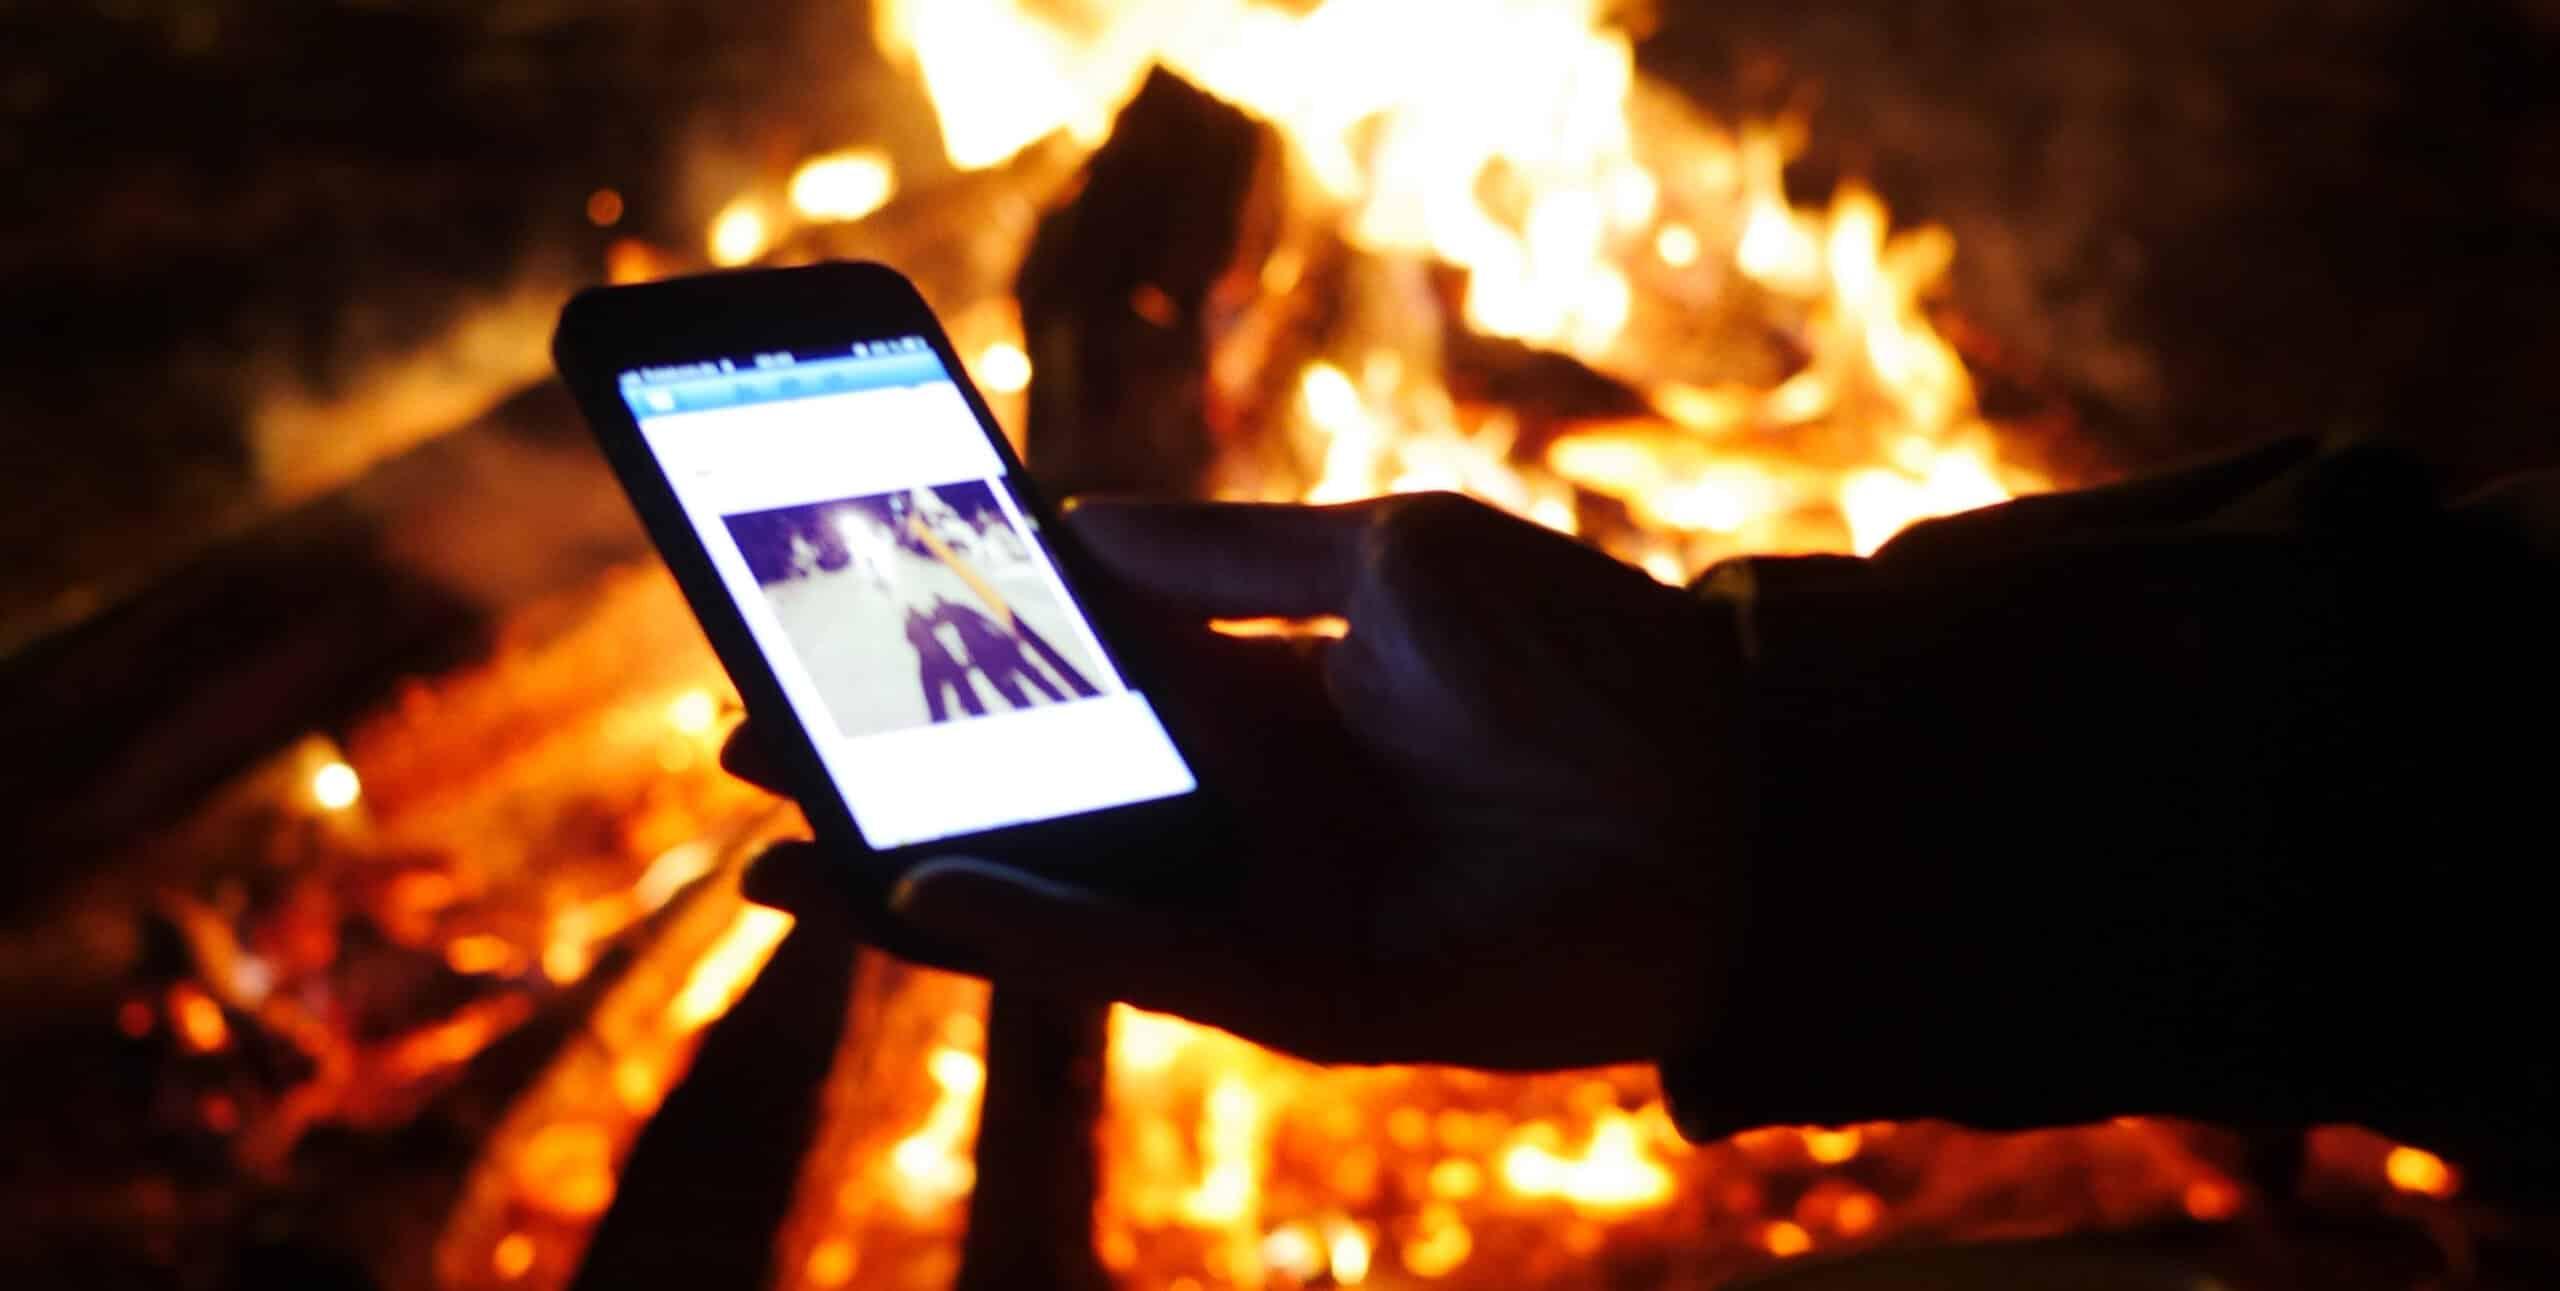 thermal-smartphone iPhone 6S Plus و Galaxy S7 edge يعانيان من الحرارة الزائدة فيما موتورولا الأفضل